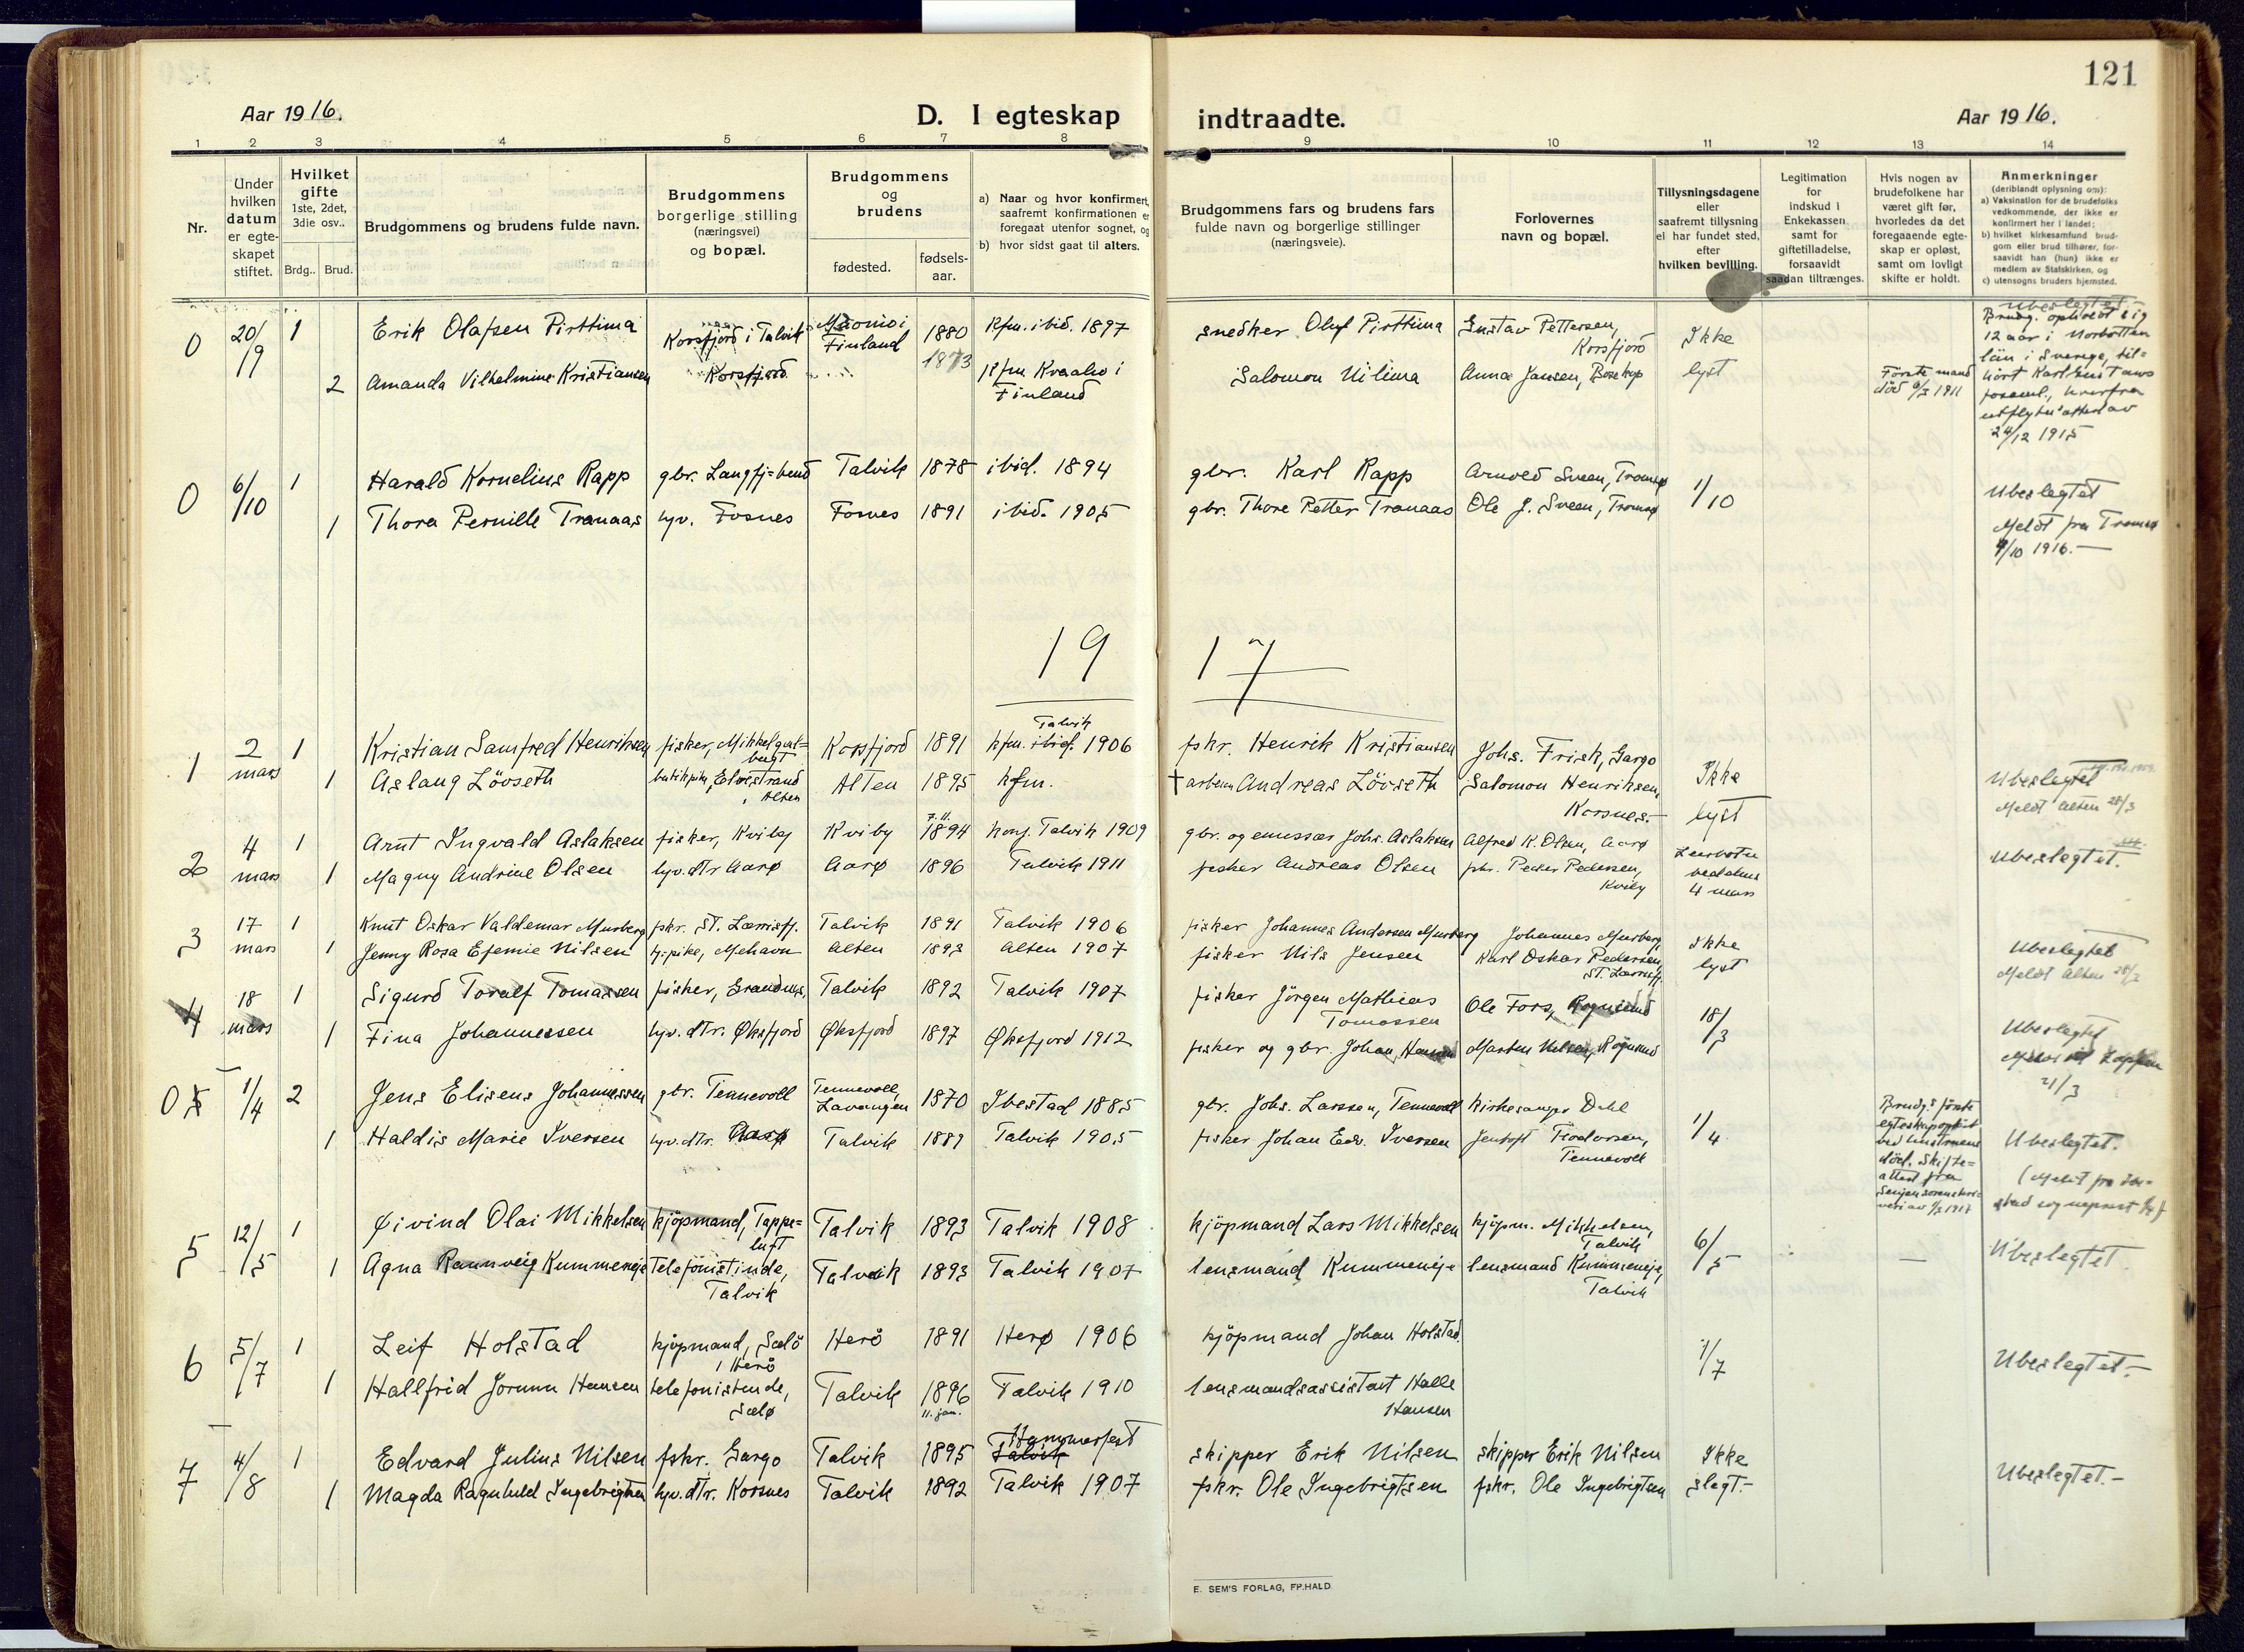 SATØ, Talvik sokneprestkontor, H/Ha/L0018kirke: Ministerialbok nr. 18, 1915-1924, s. 121